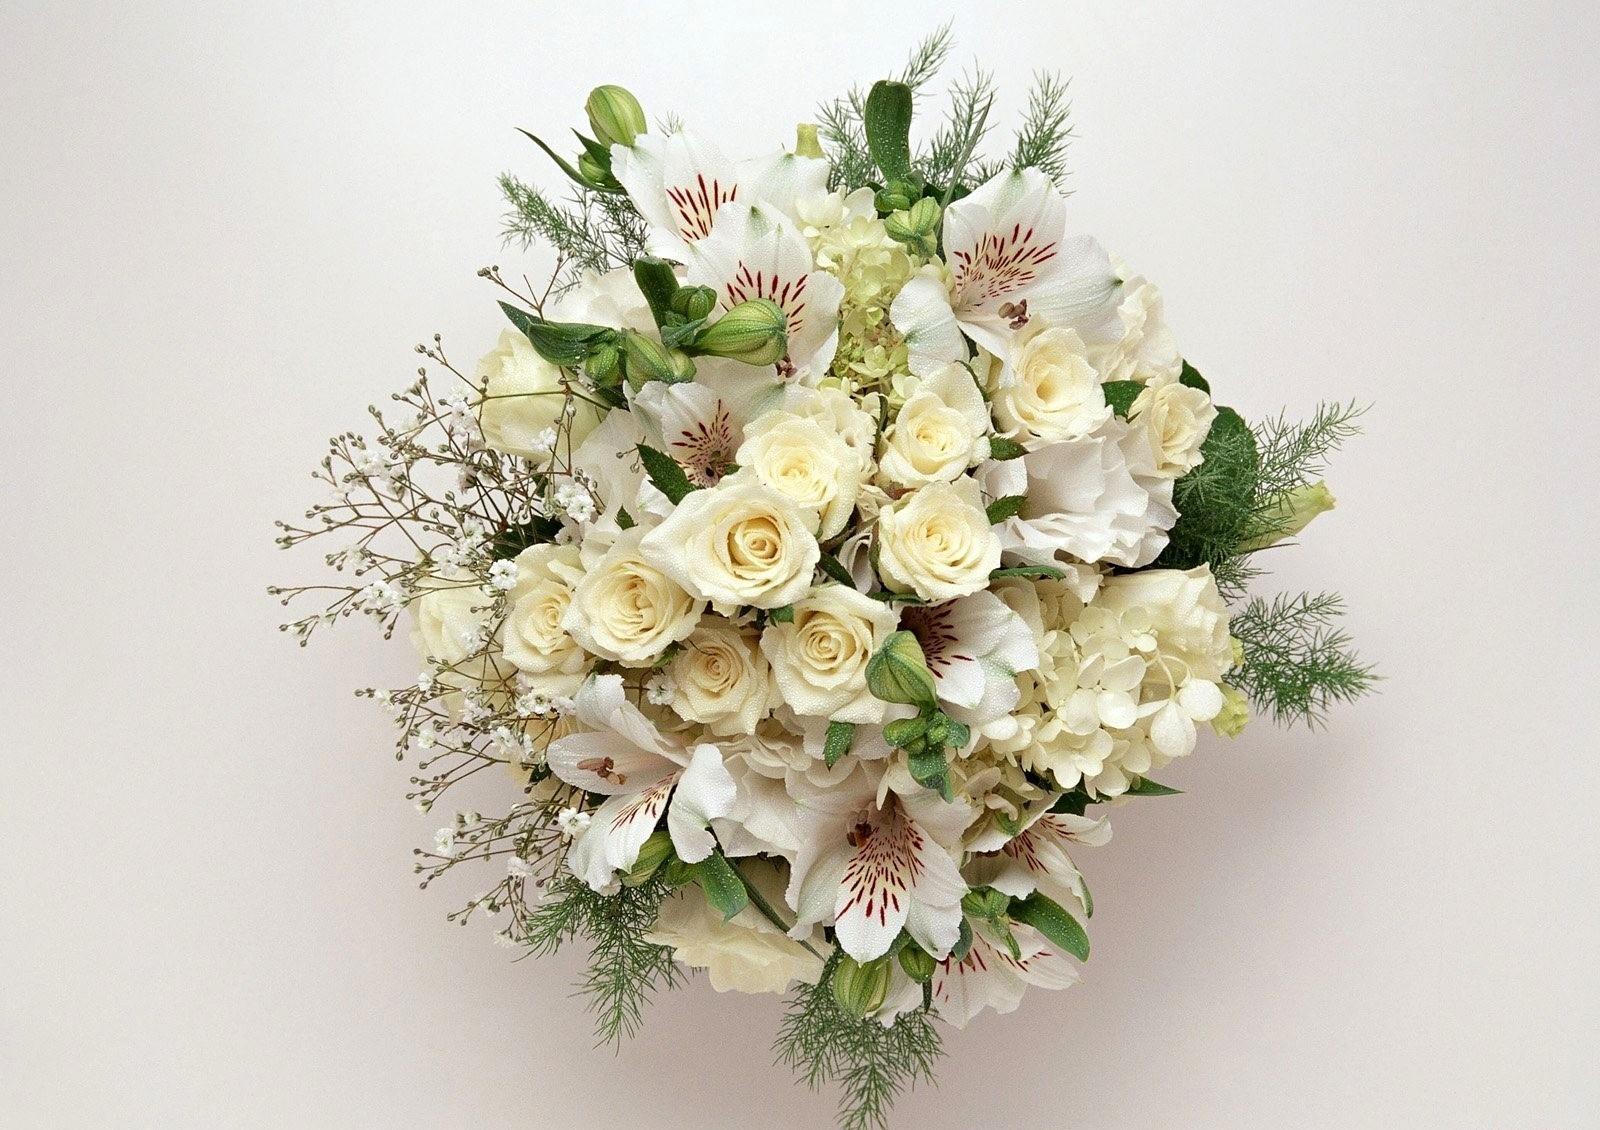 Wallpaper Roses Alstroemeria Flowers Babys Breath Bouquet Design Tender 1600x1130 Wallpaperup 1069233 Hd Wallpapers Wallhere